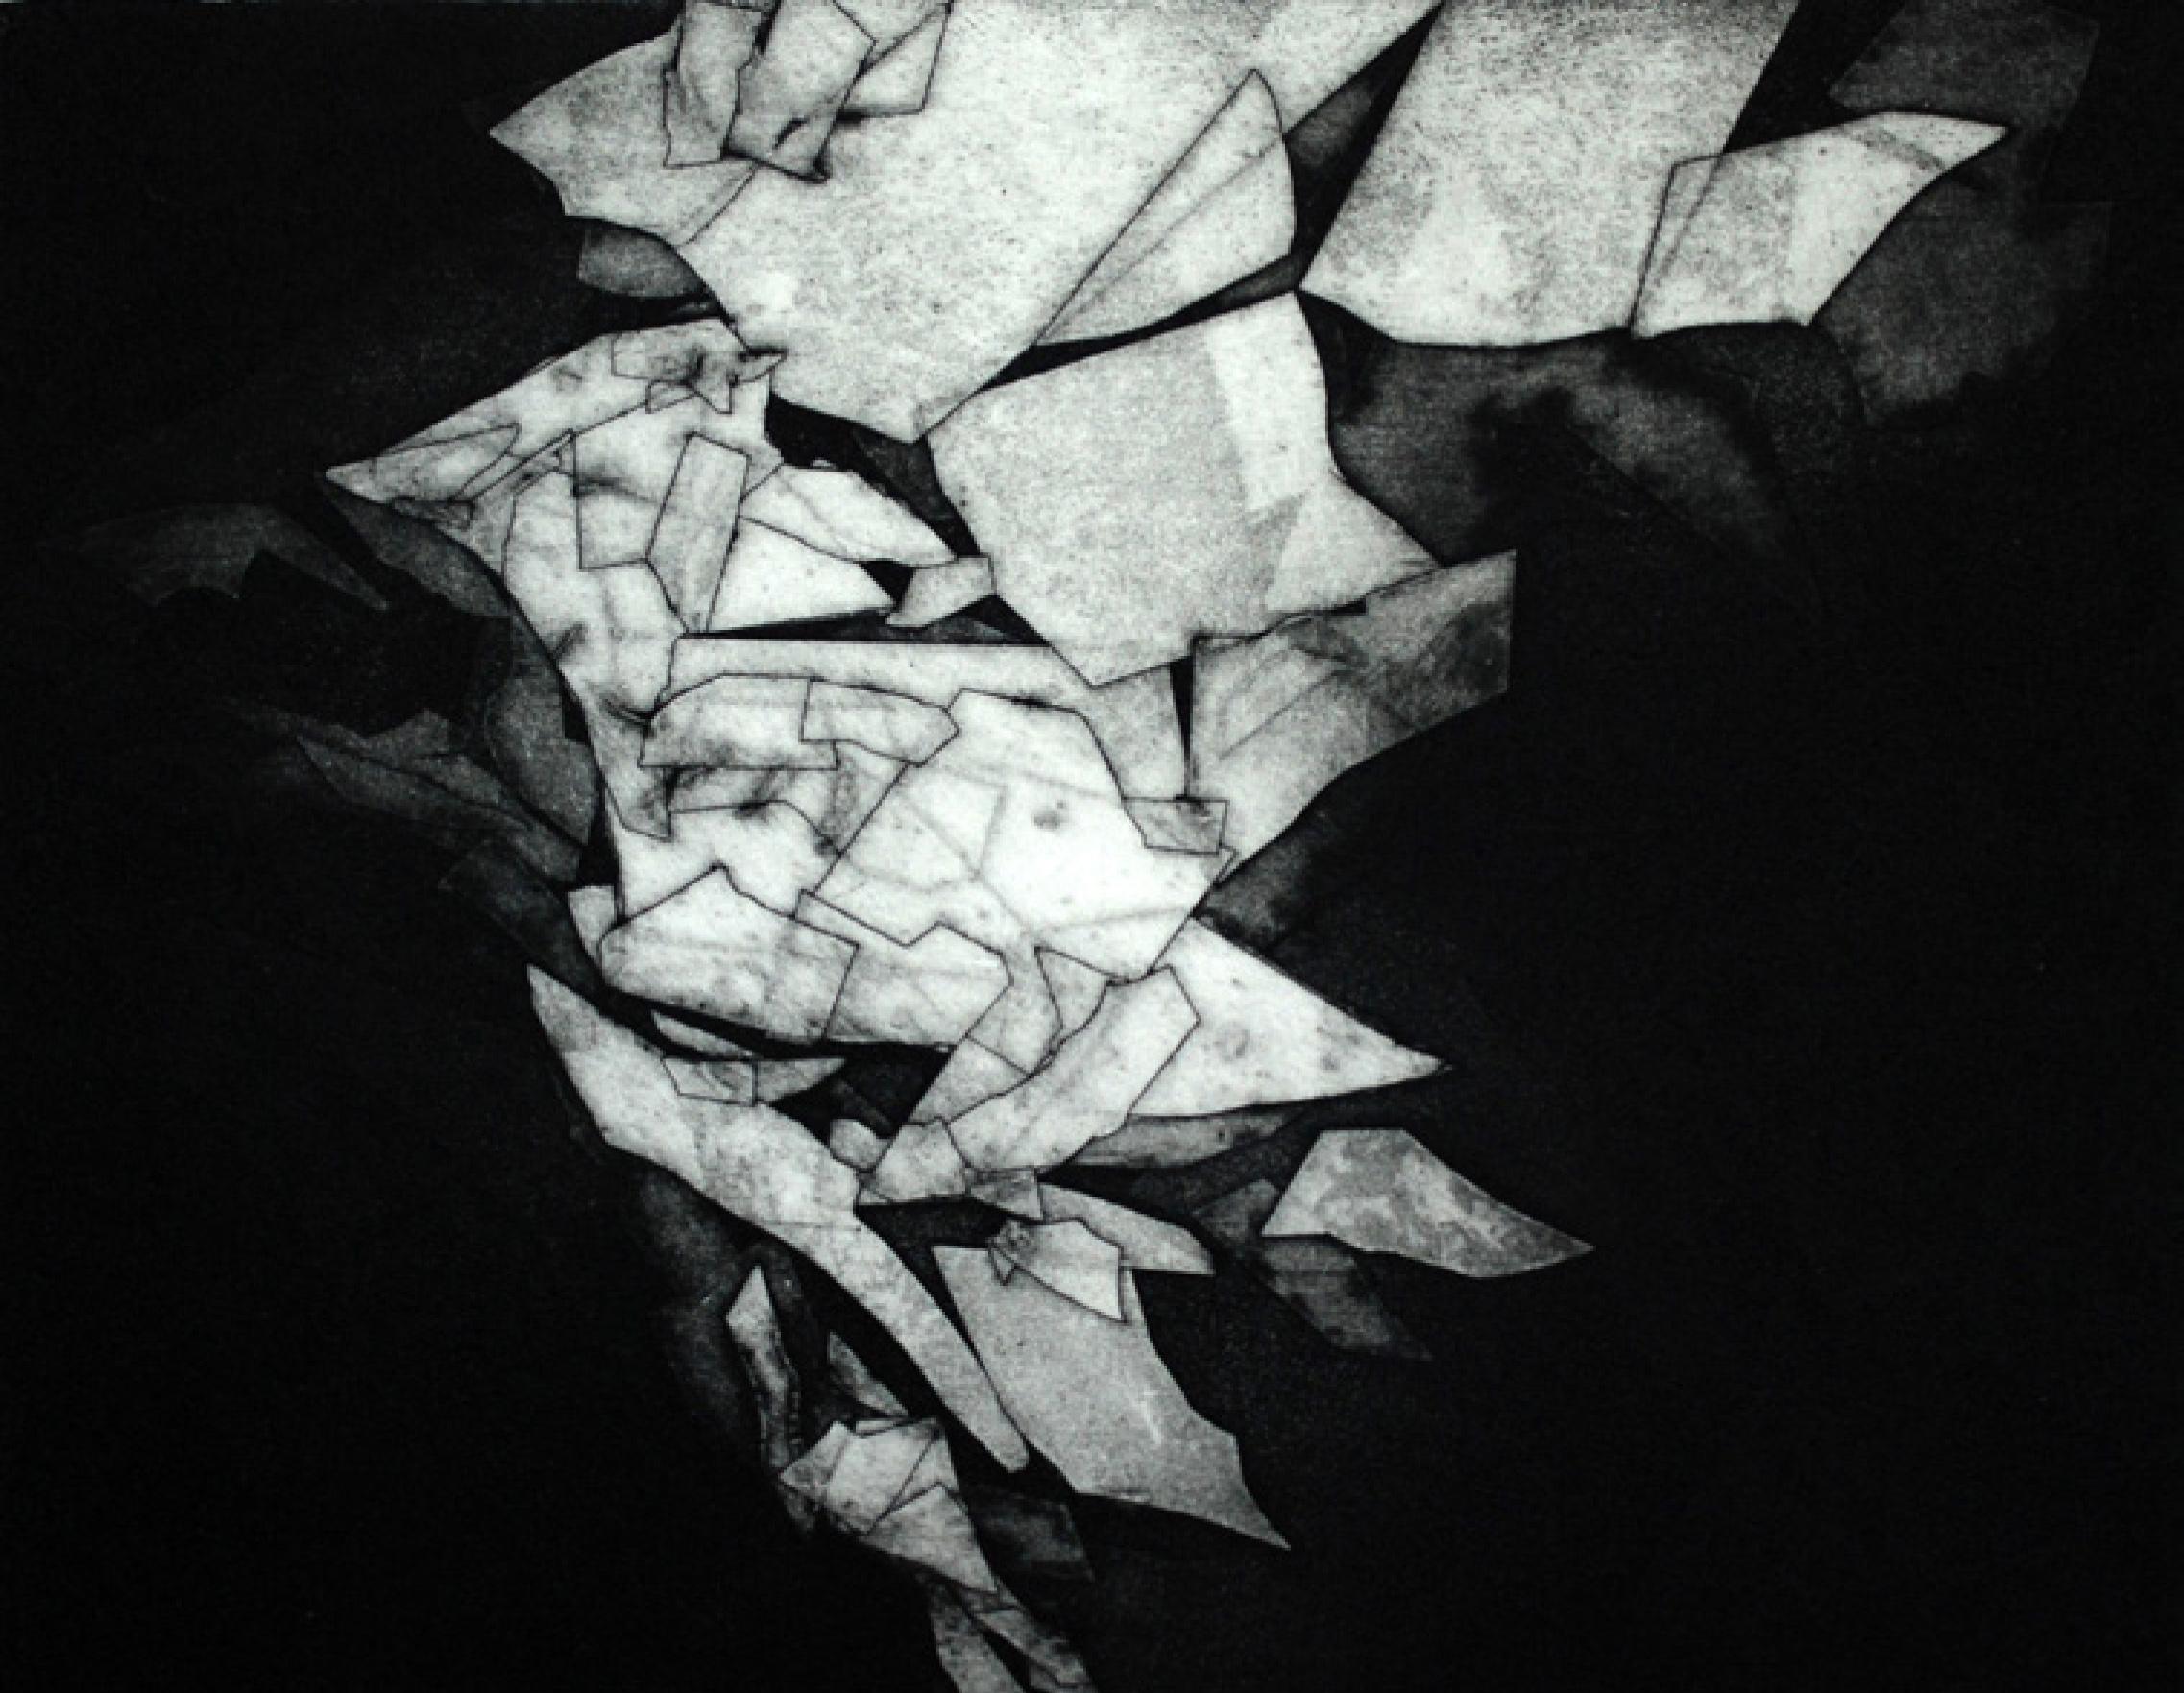 12 | Kerstin Franke-Gneuß | Wechsel | 2017 | Aquatinta | 26,7 x 43,3 cm | Kunstlotterie